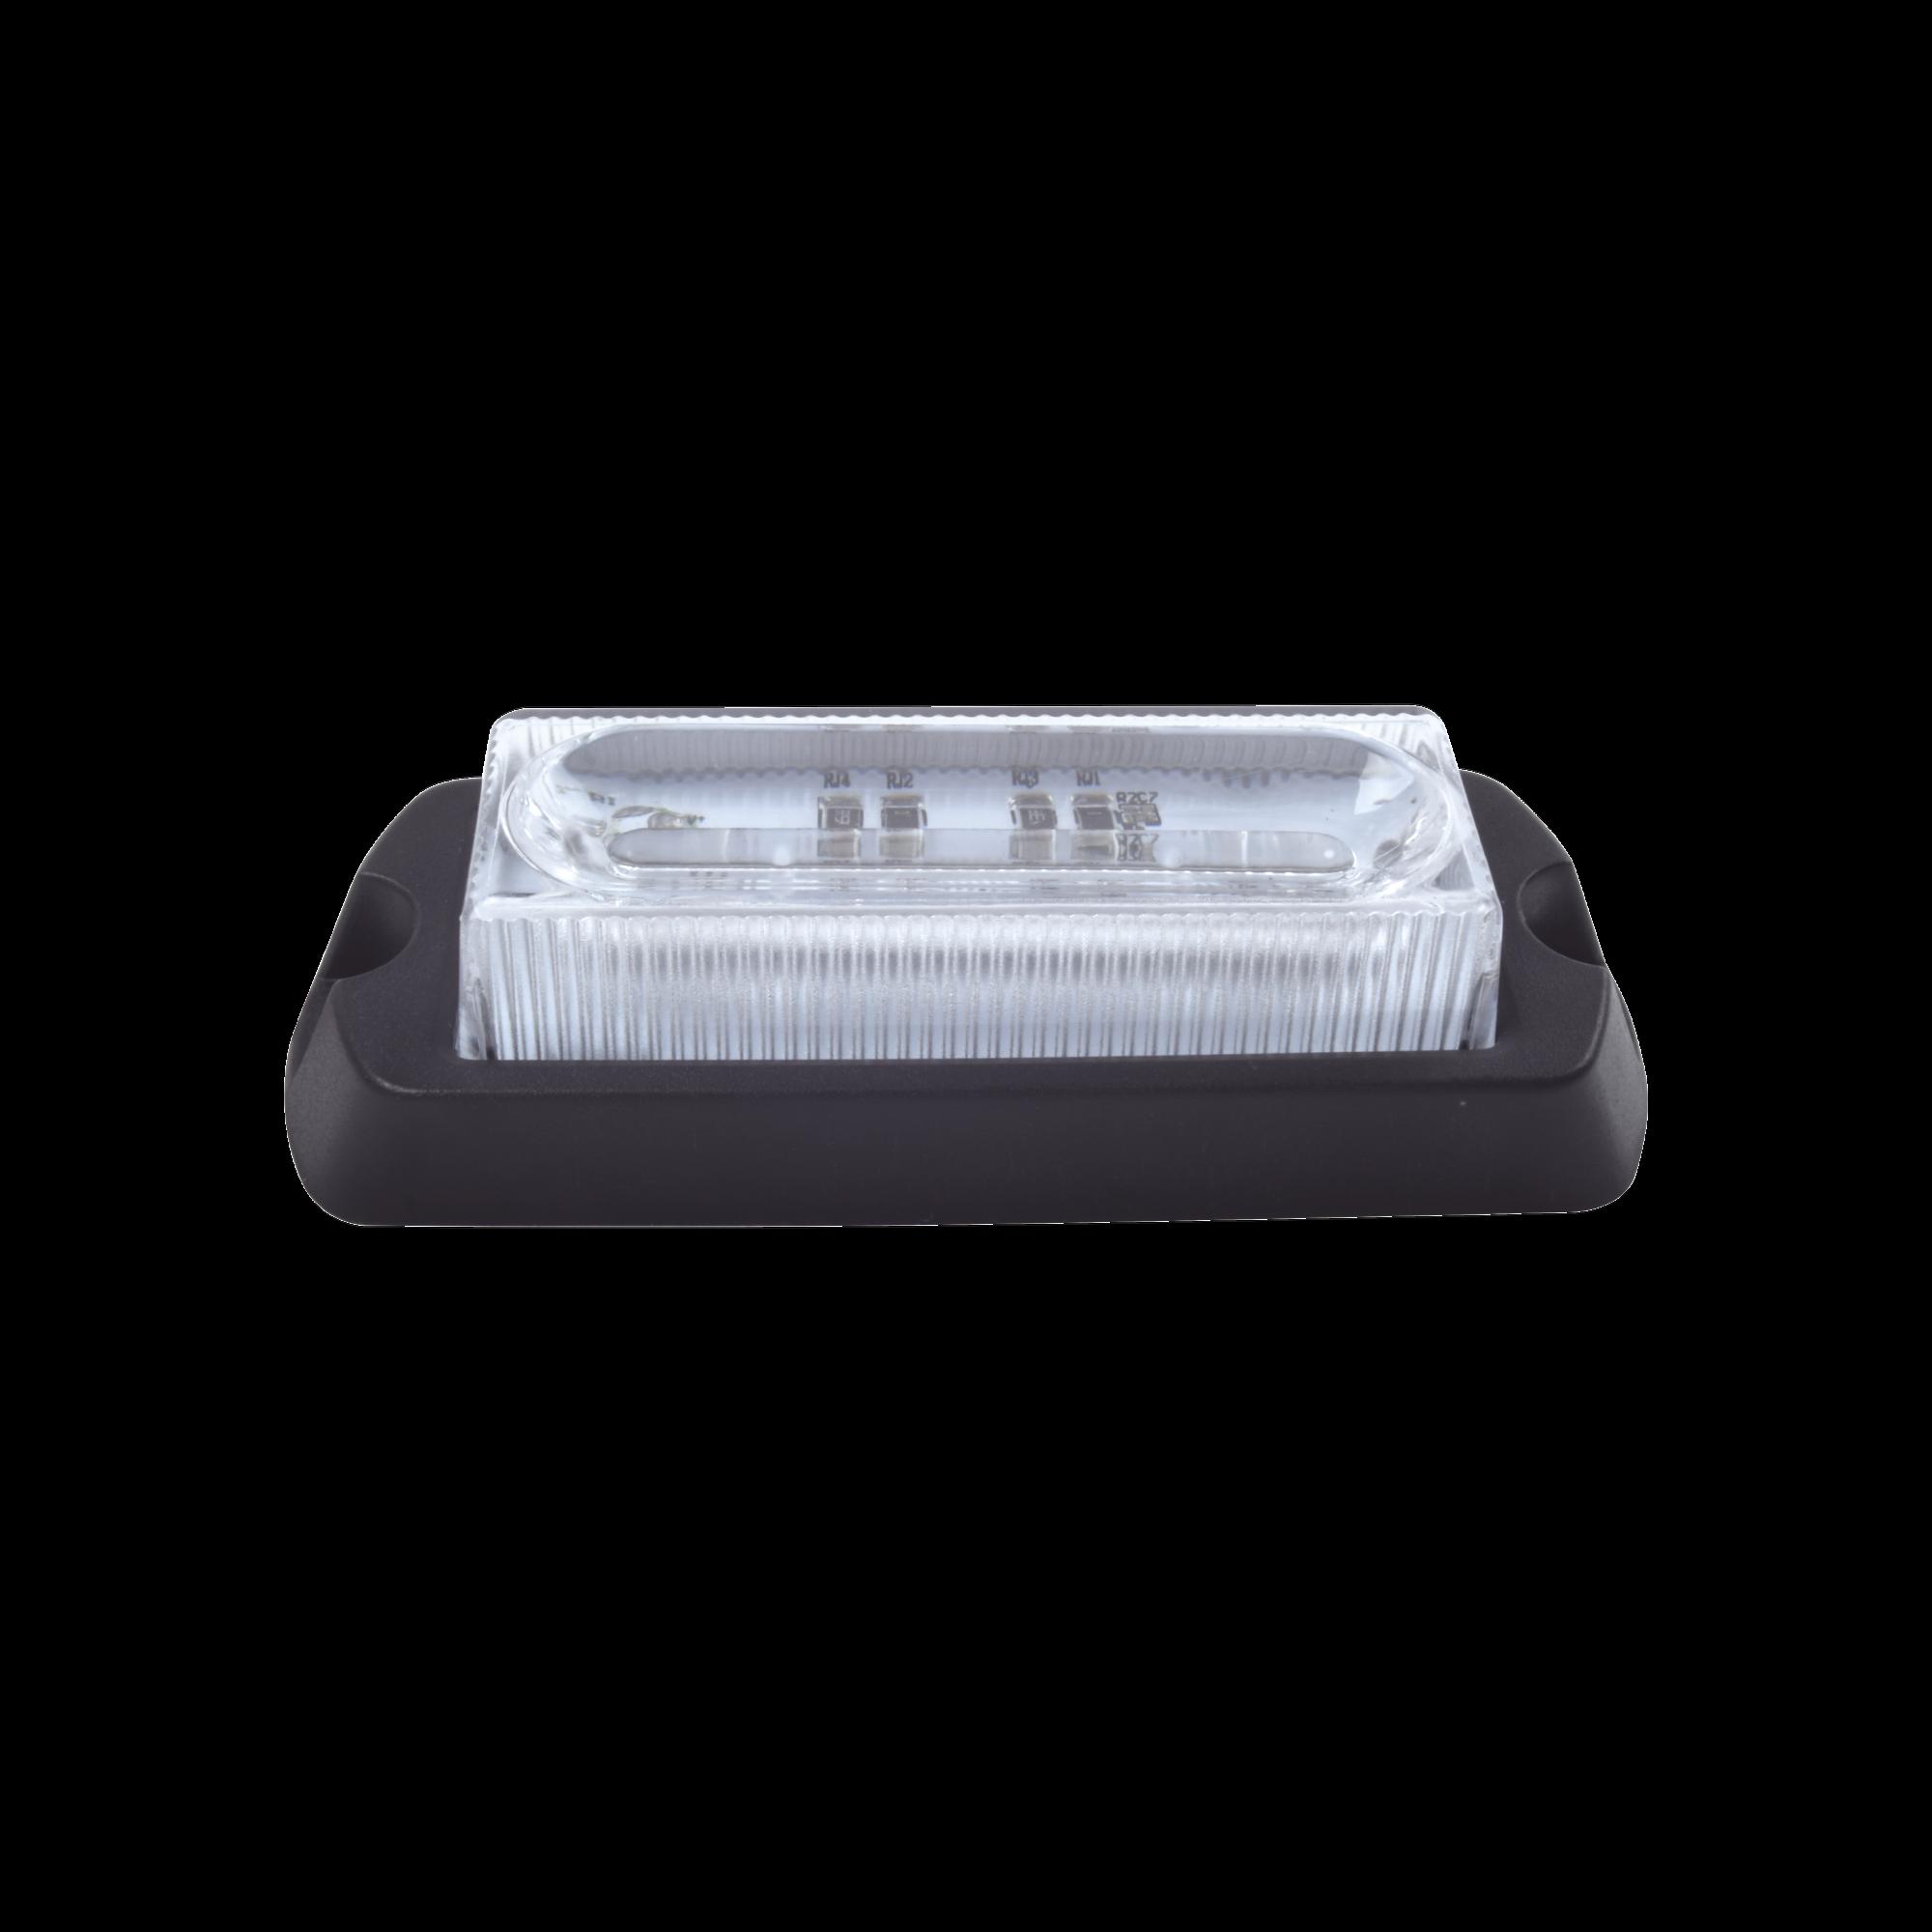 Luz Auxiliar Ultra Brillante X13 de 4 LEDs, Color Claro, con mica transparente